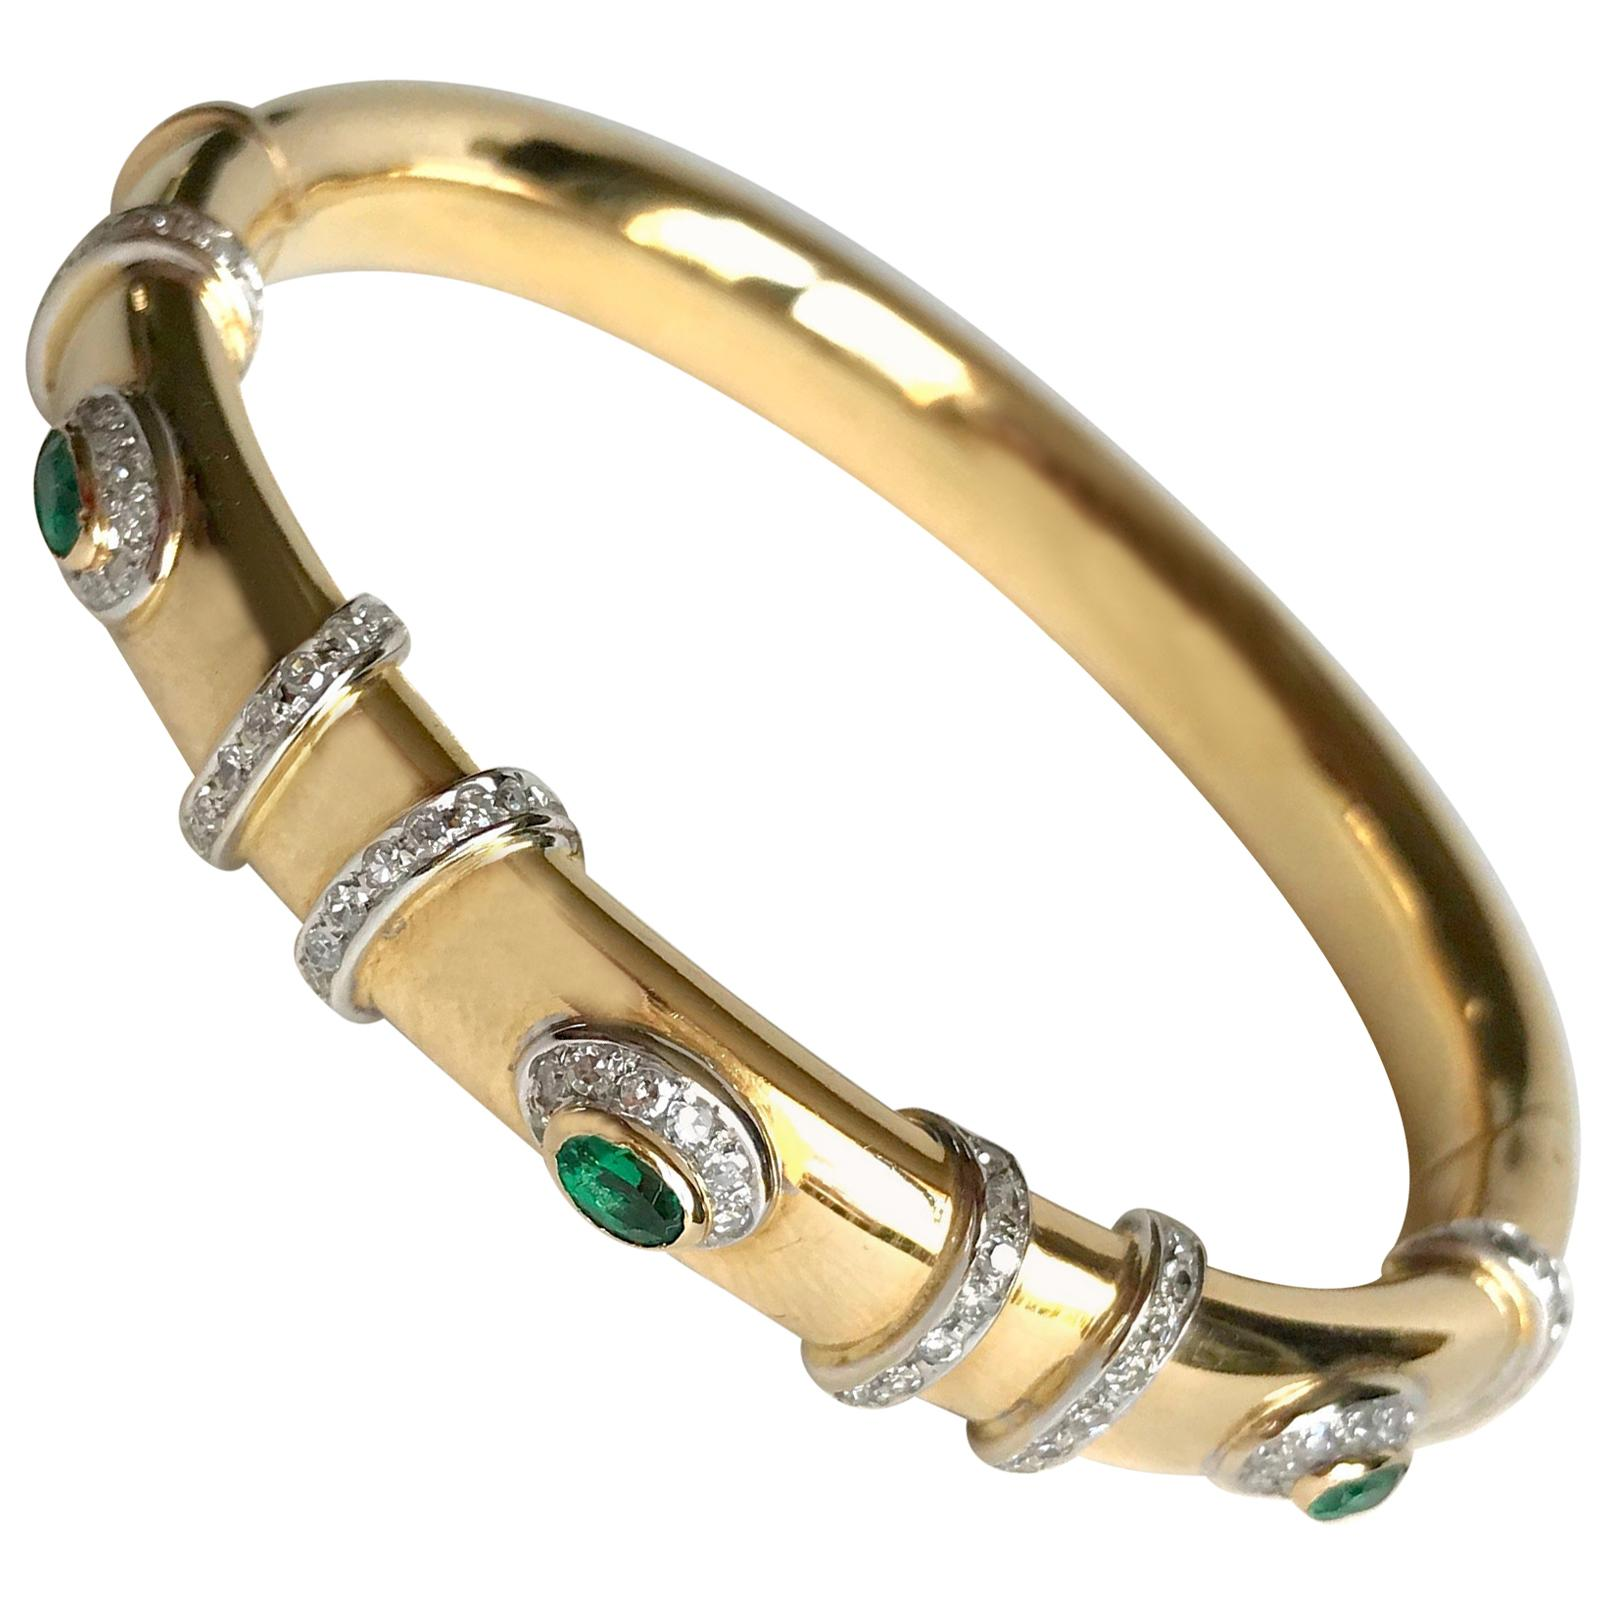 Cartier Rigid Emerald Bracelet  in Gold 18 Carat and Diamonds